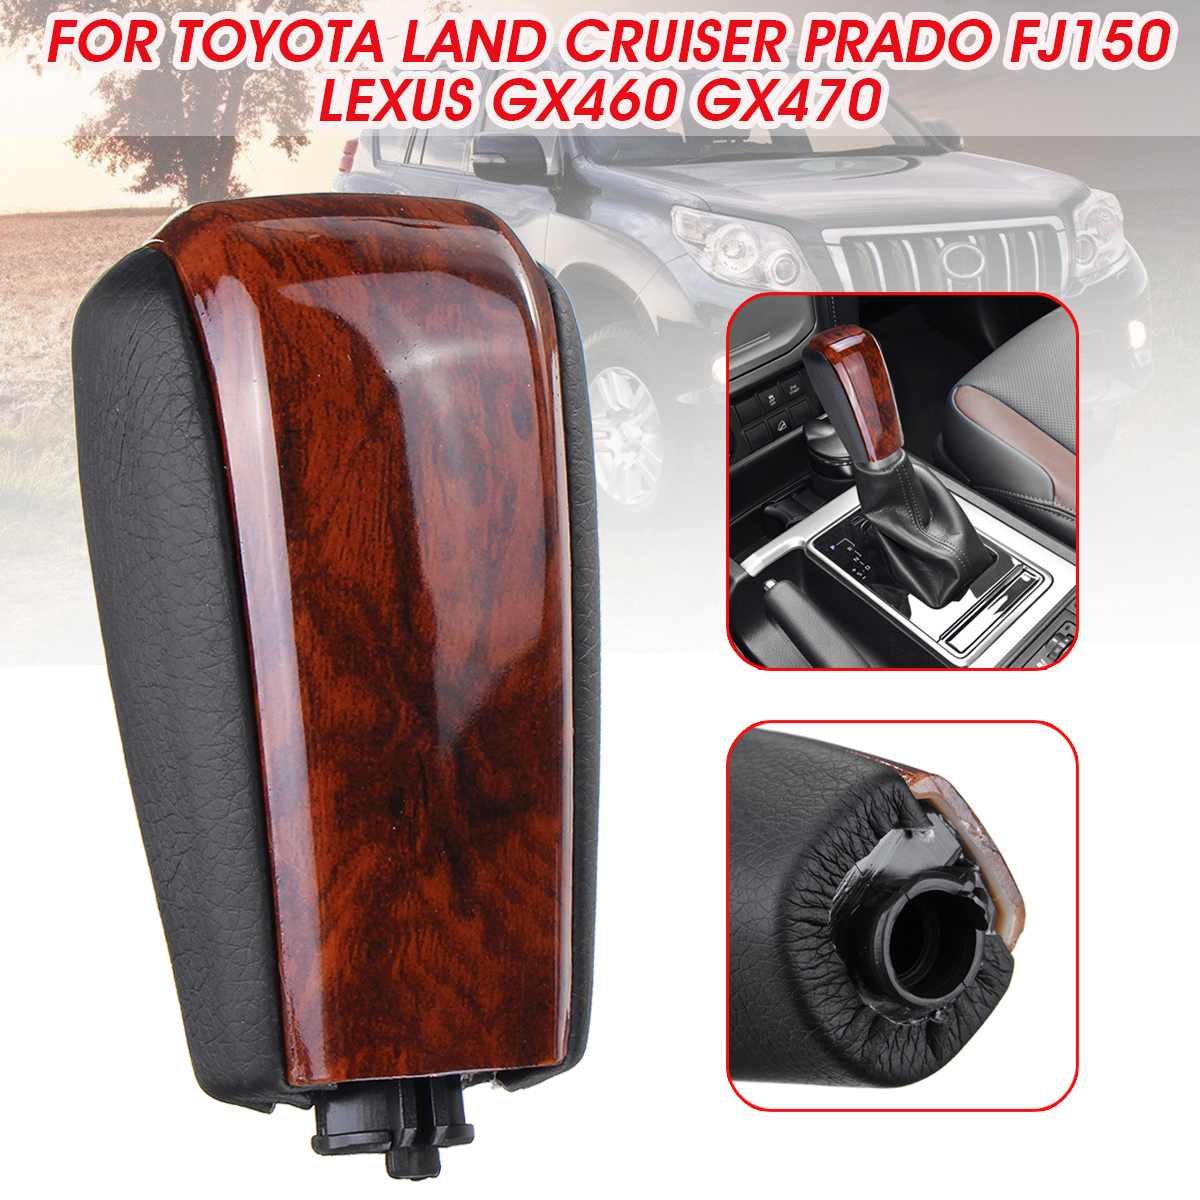 PU Leather Car AT Gear Shift Knob Gear Stick Shifter Lever For Toyota Land Cruiser Prado FJ150 For Lexus GX460 GX470